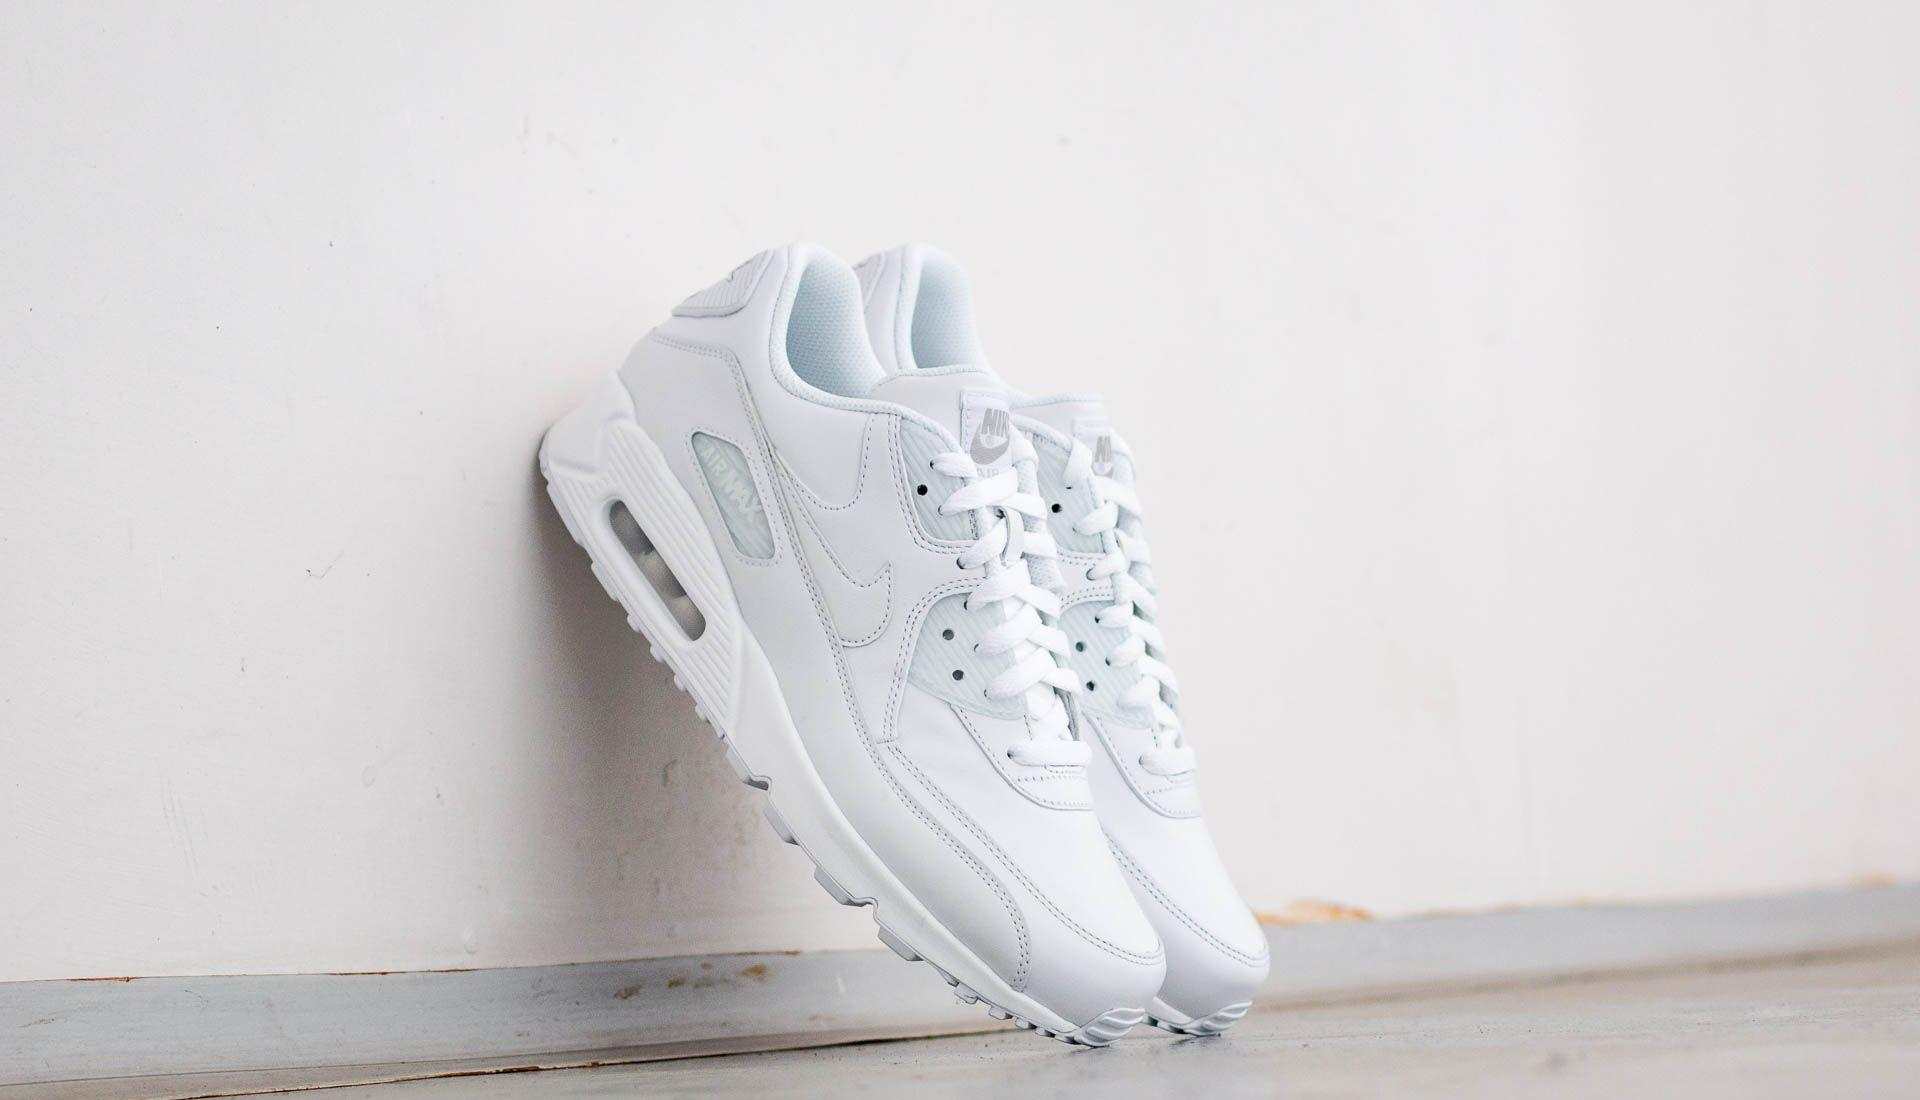 Nike Air Max 90 Leather True White/ True White